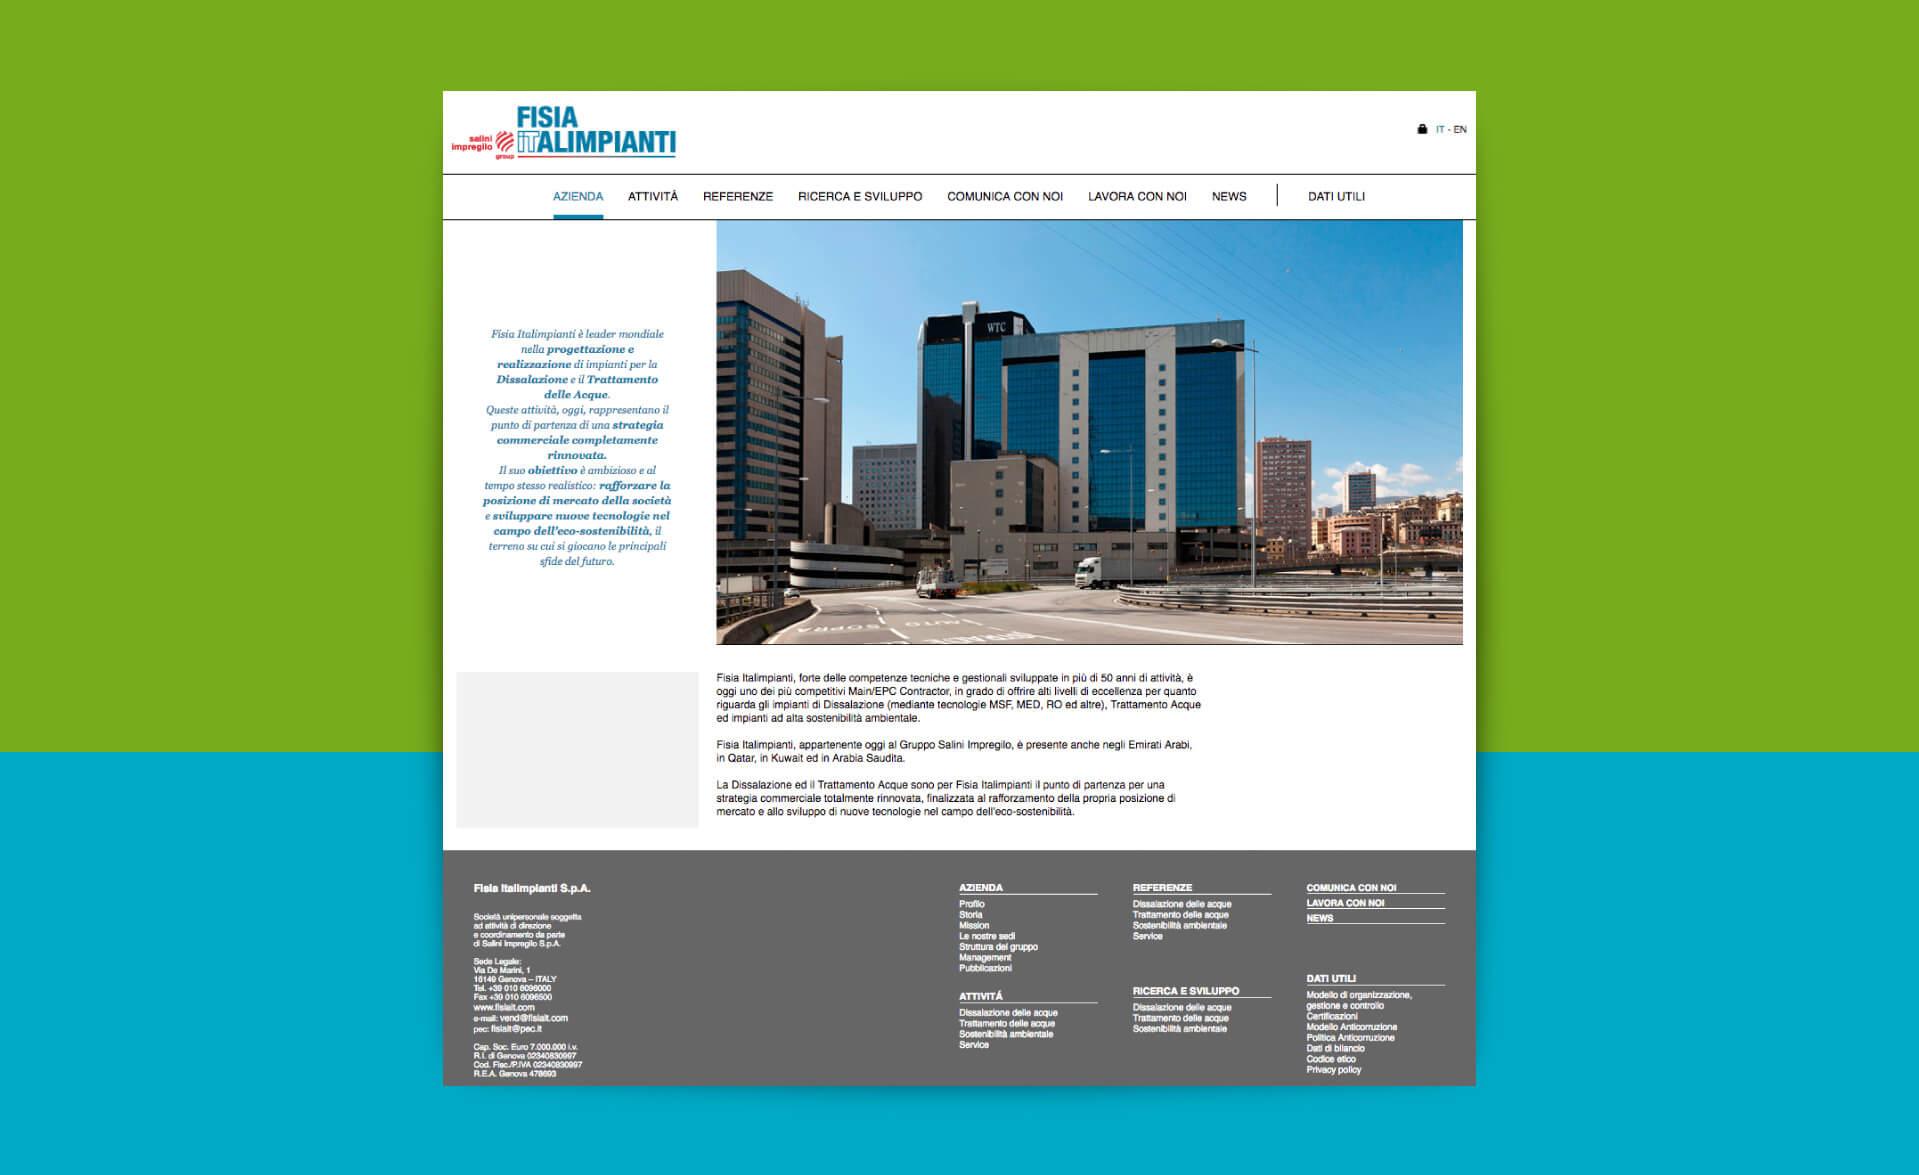 mintlab-webdesign-fisia-italimpianti-03